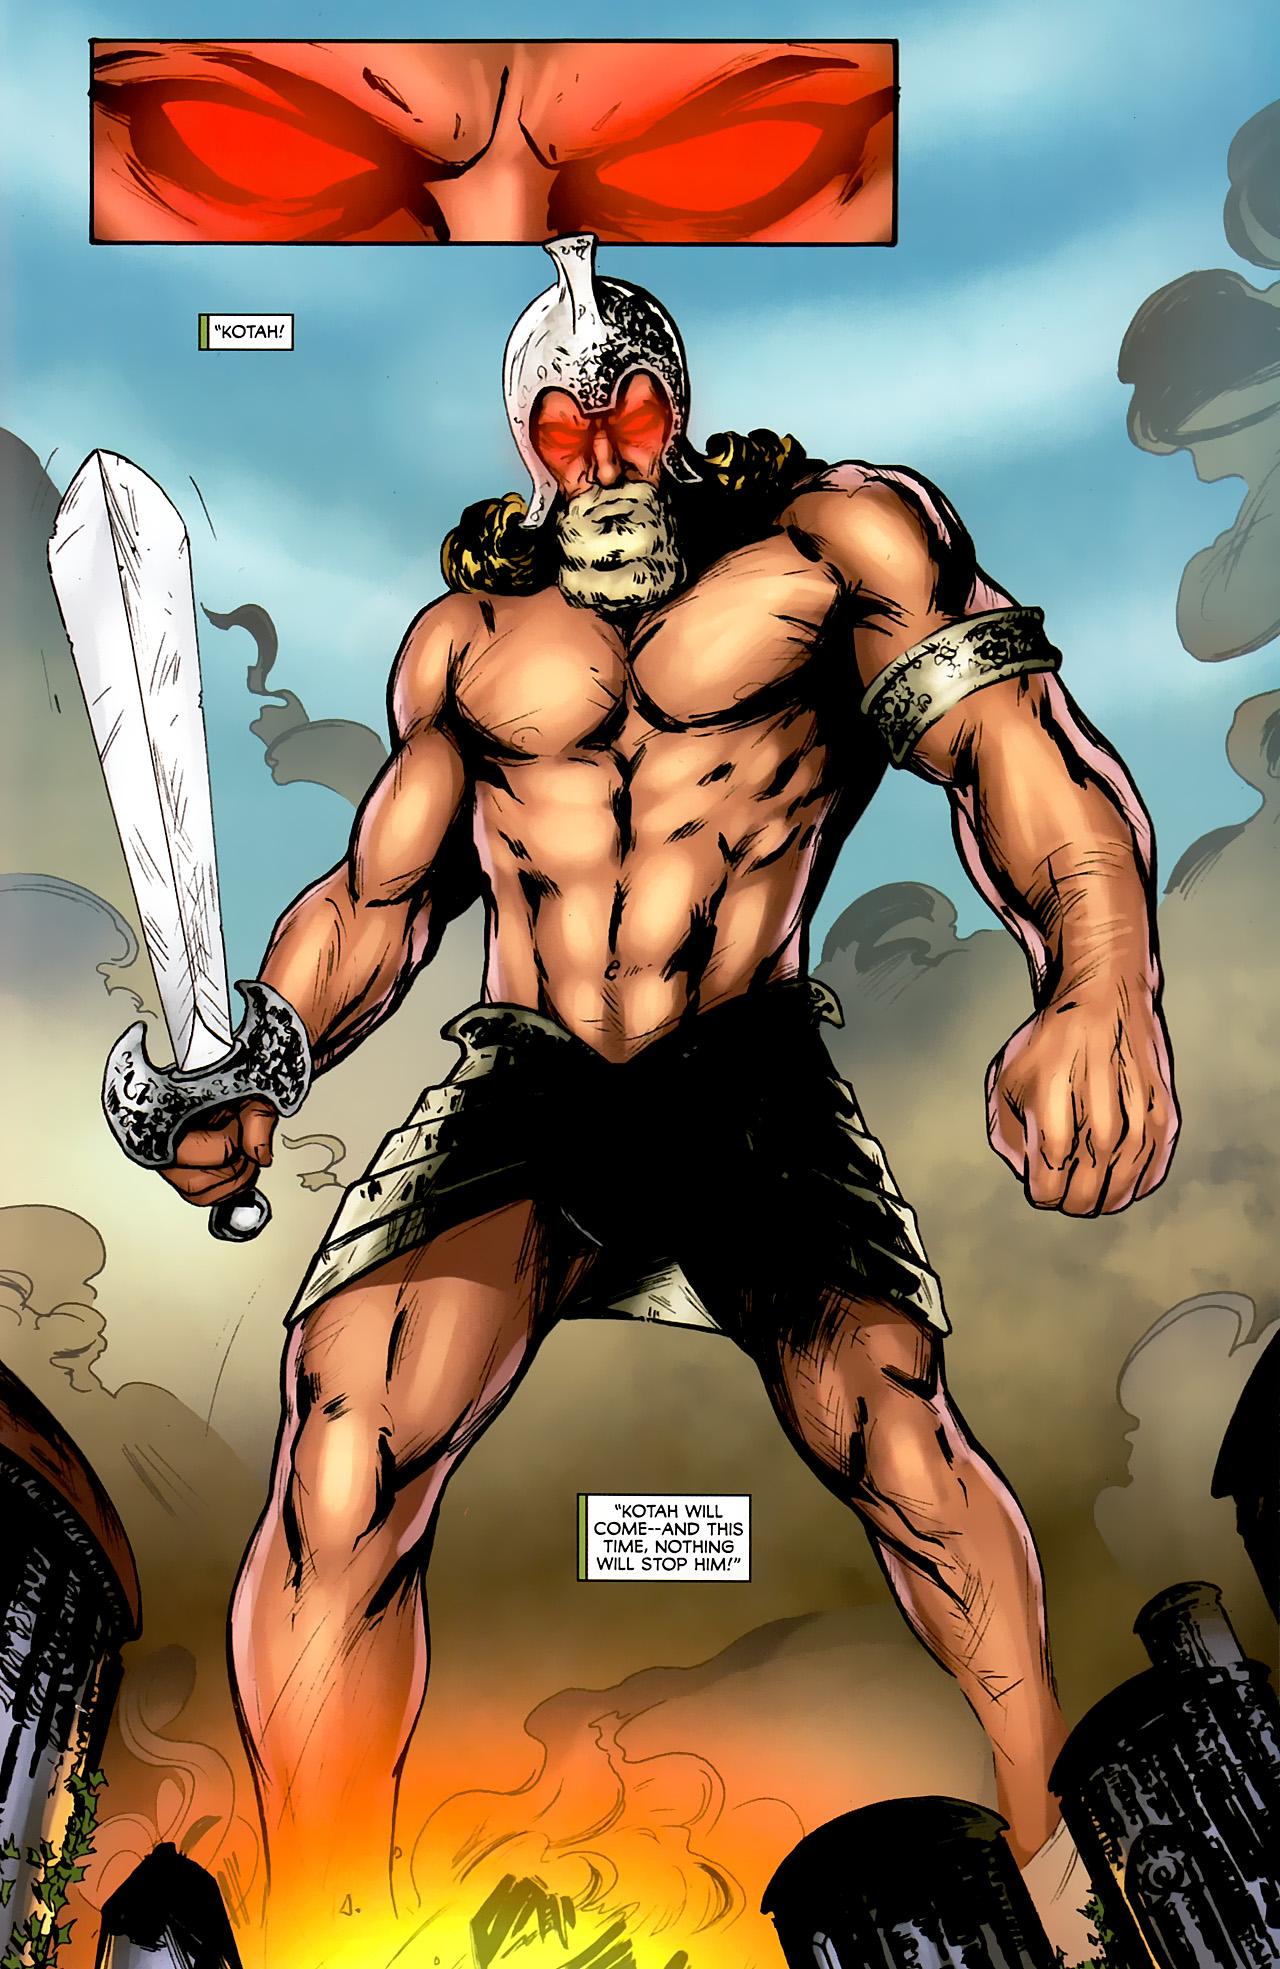 Read online Stargate: Daniel Jackson comic -  Issue #4 - 17